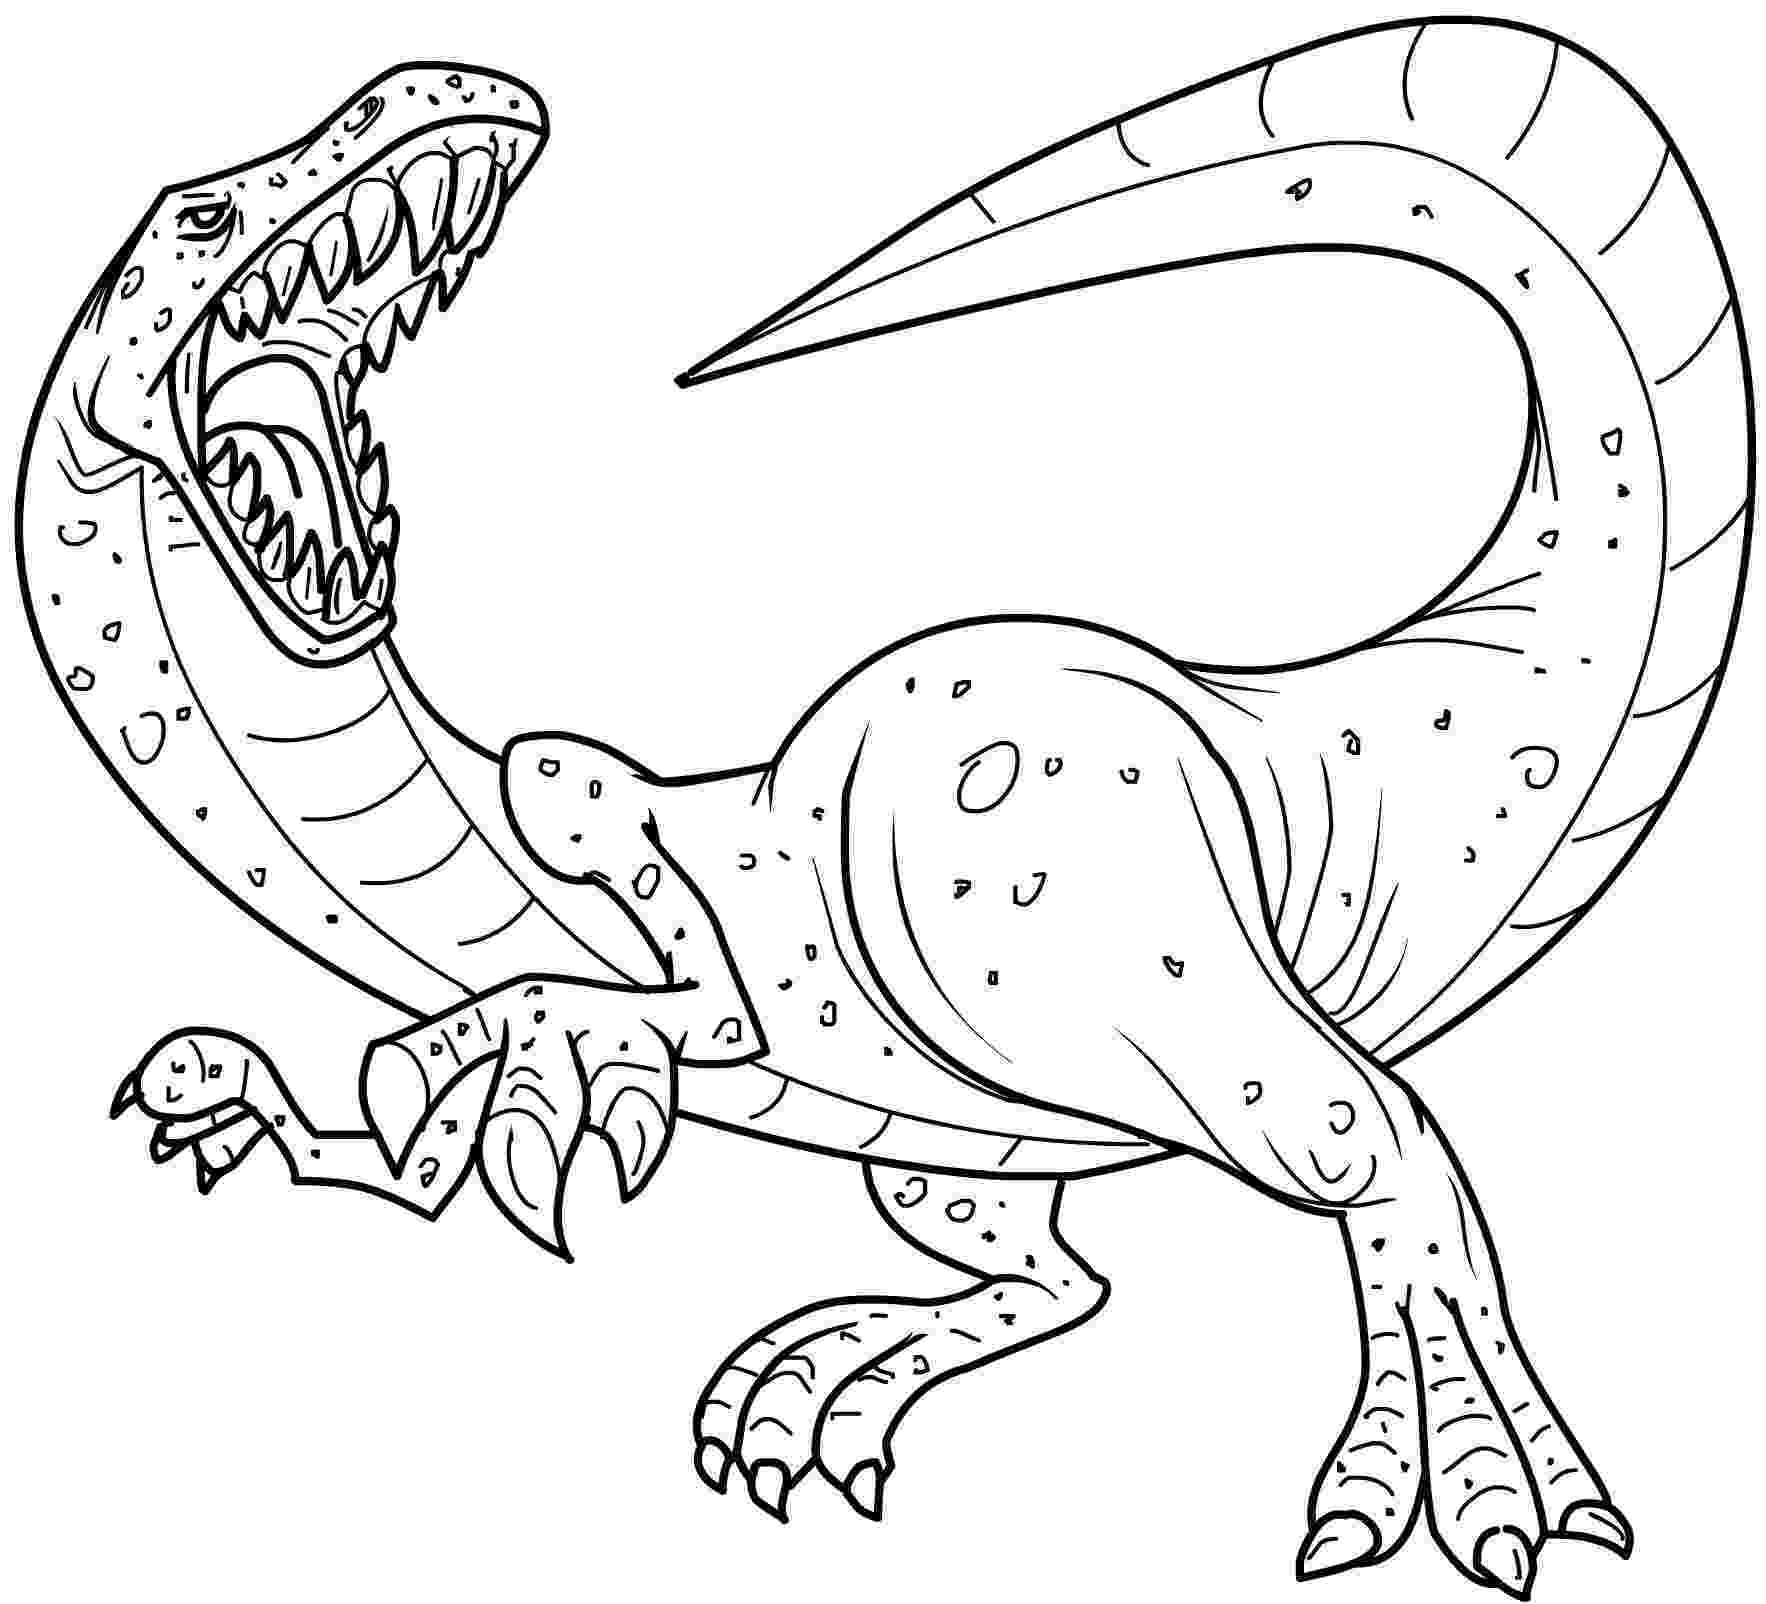 dinosaur for coloring printable dinosaur coloring pages for kids cool2bkids dinosaur for coloring